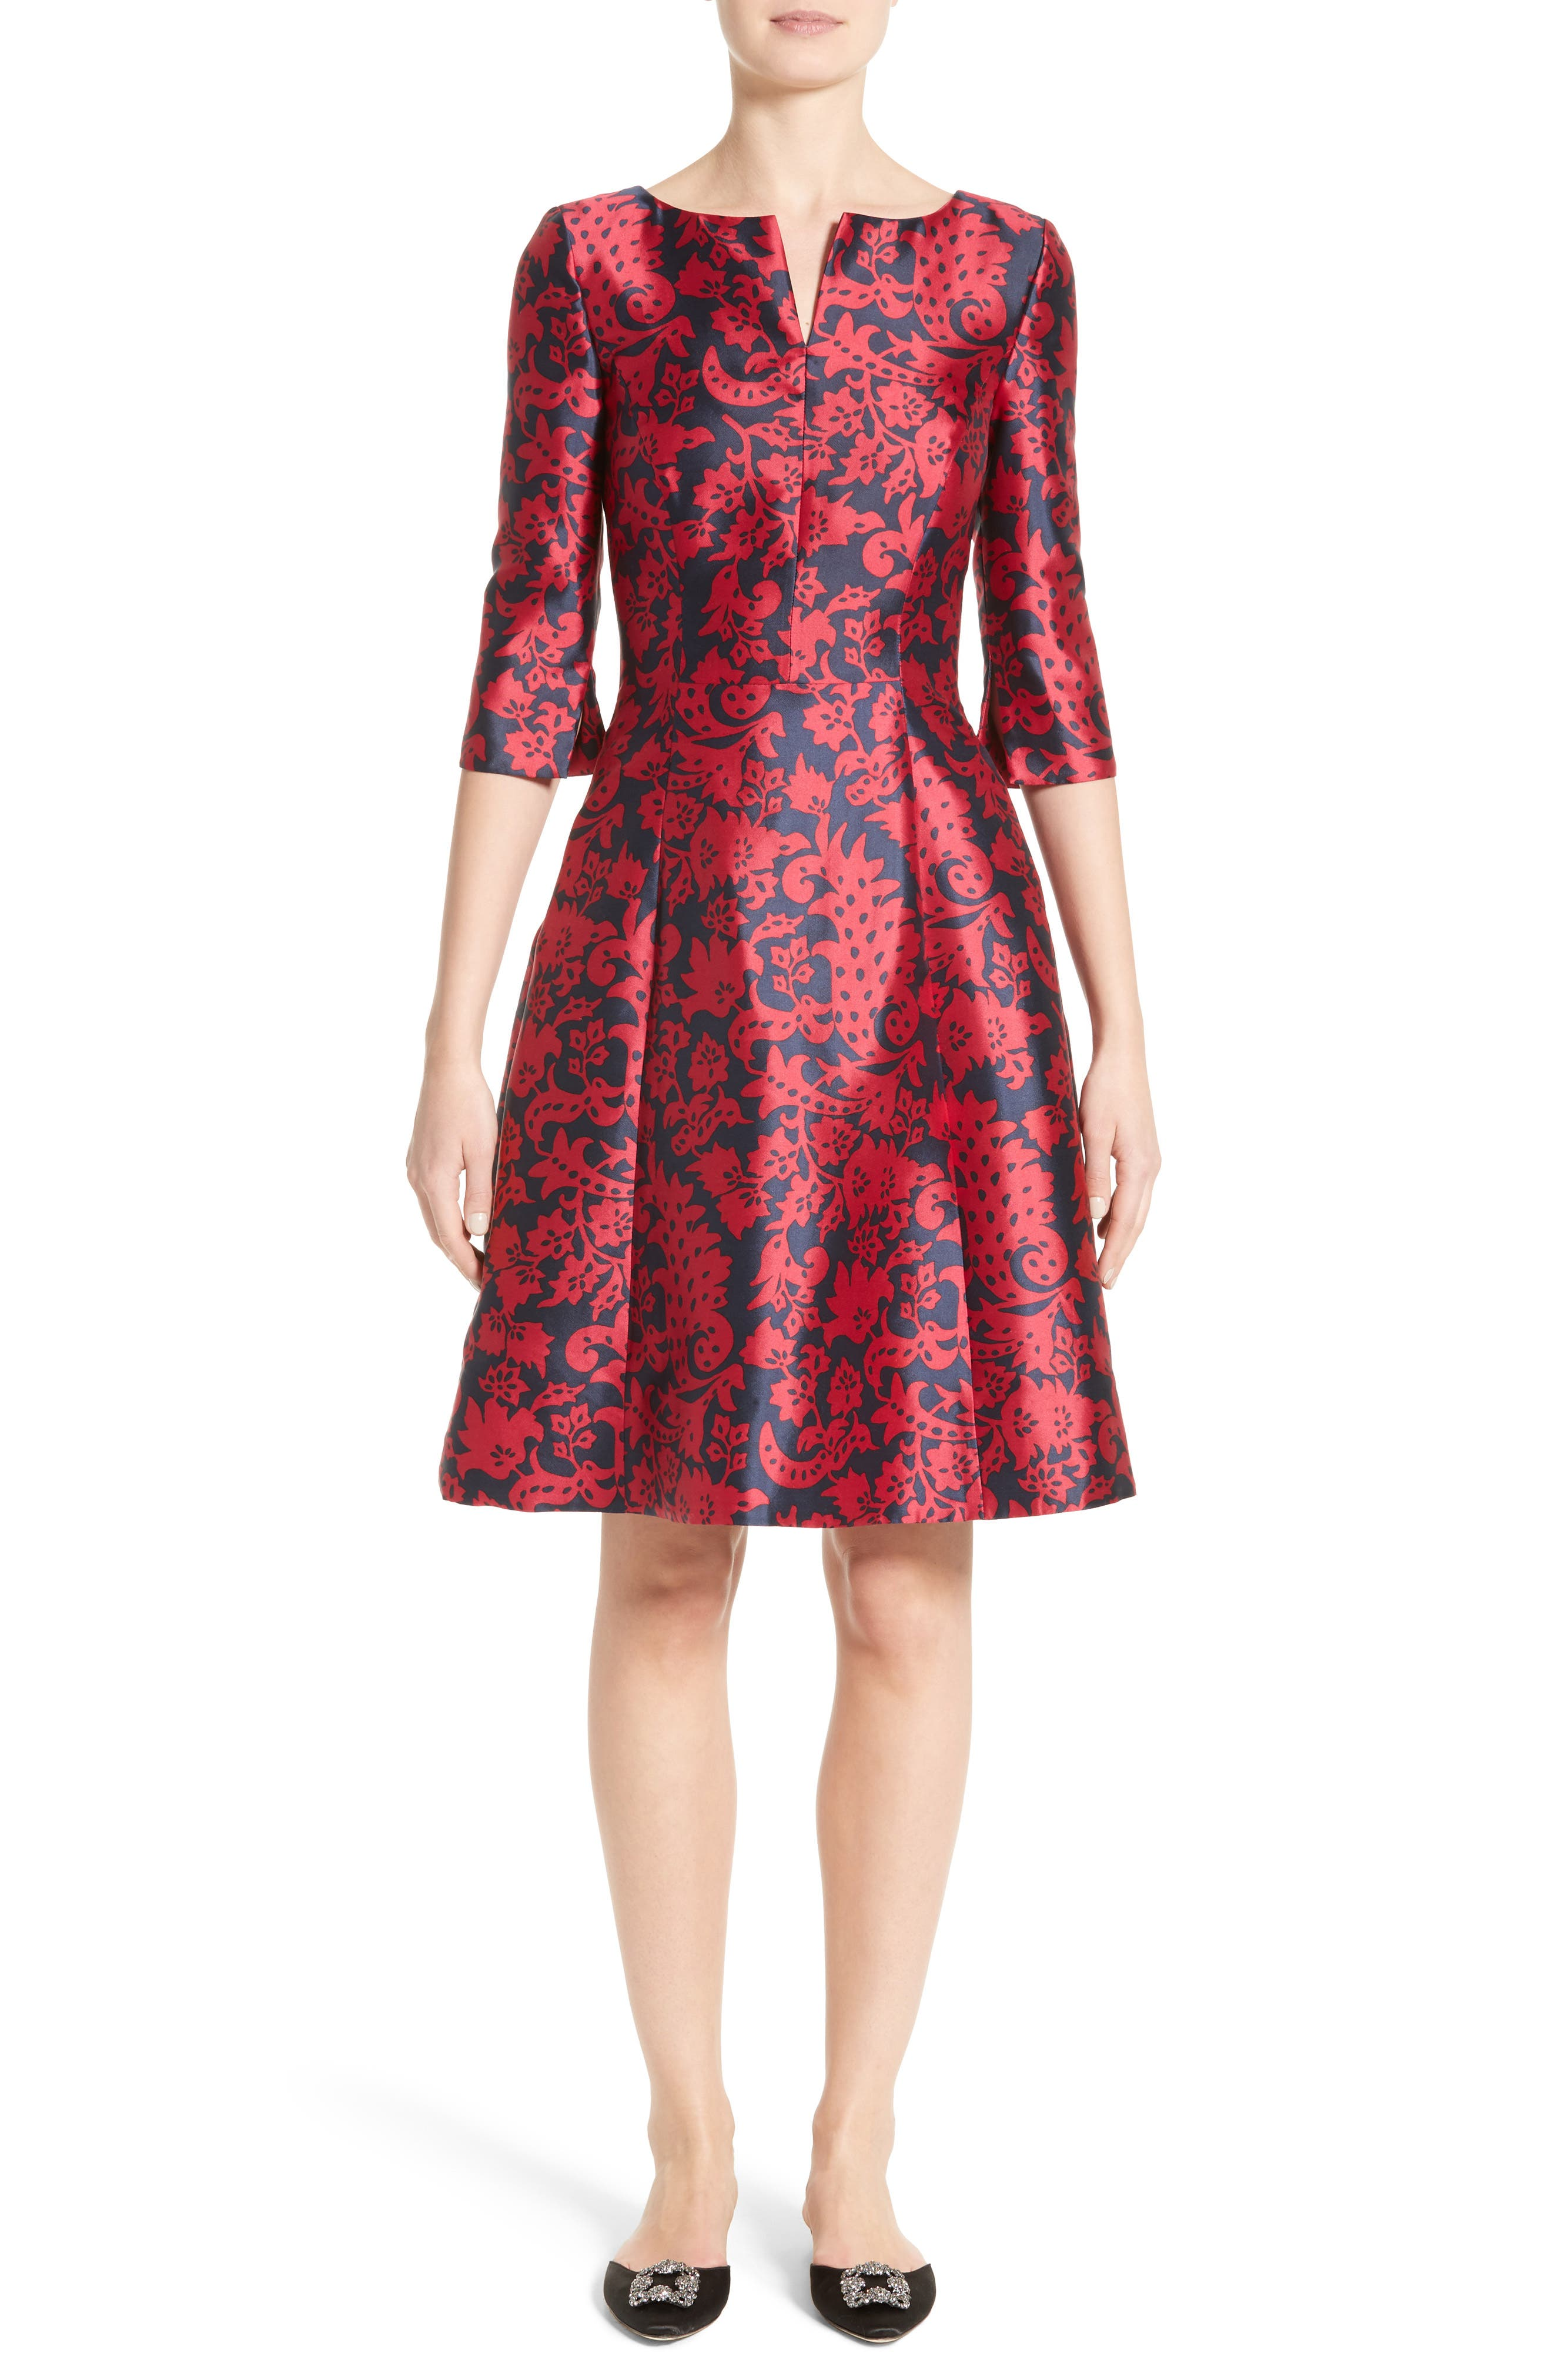 Alternate Image 1 Selected - Oscar de la Renta Print Mikado Fit & Flare Dress